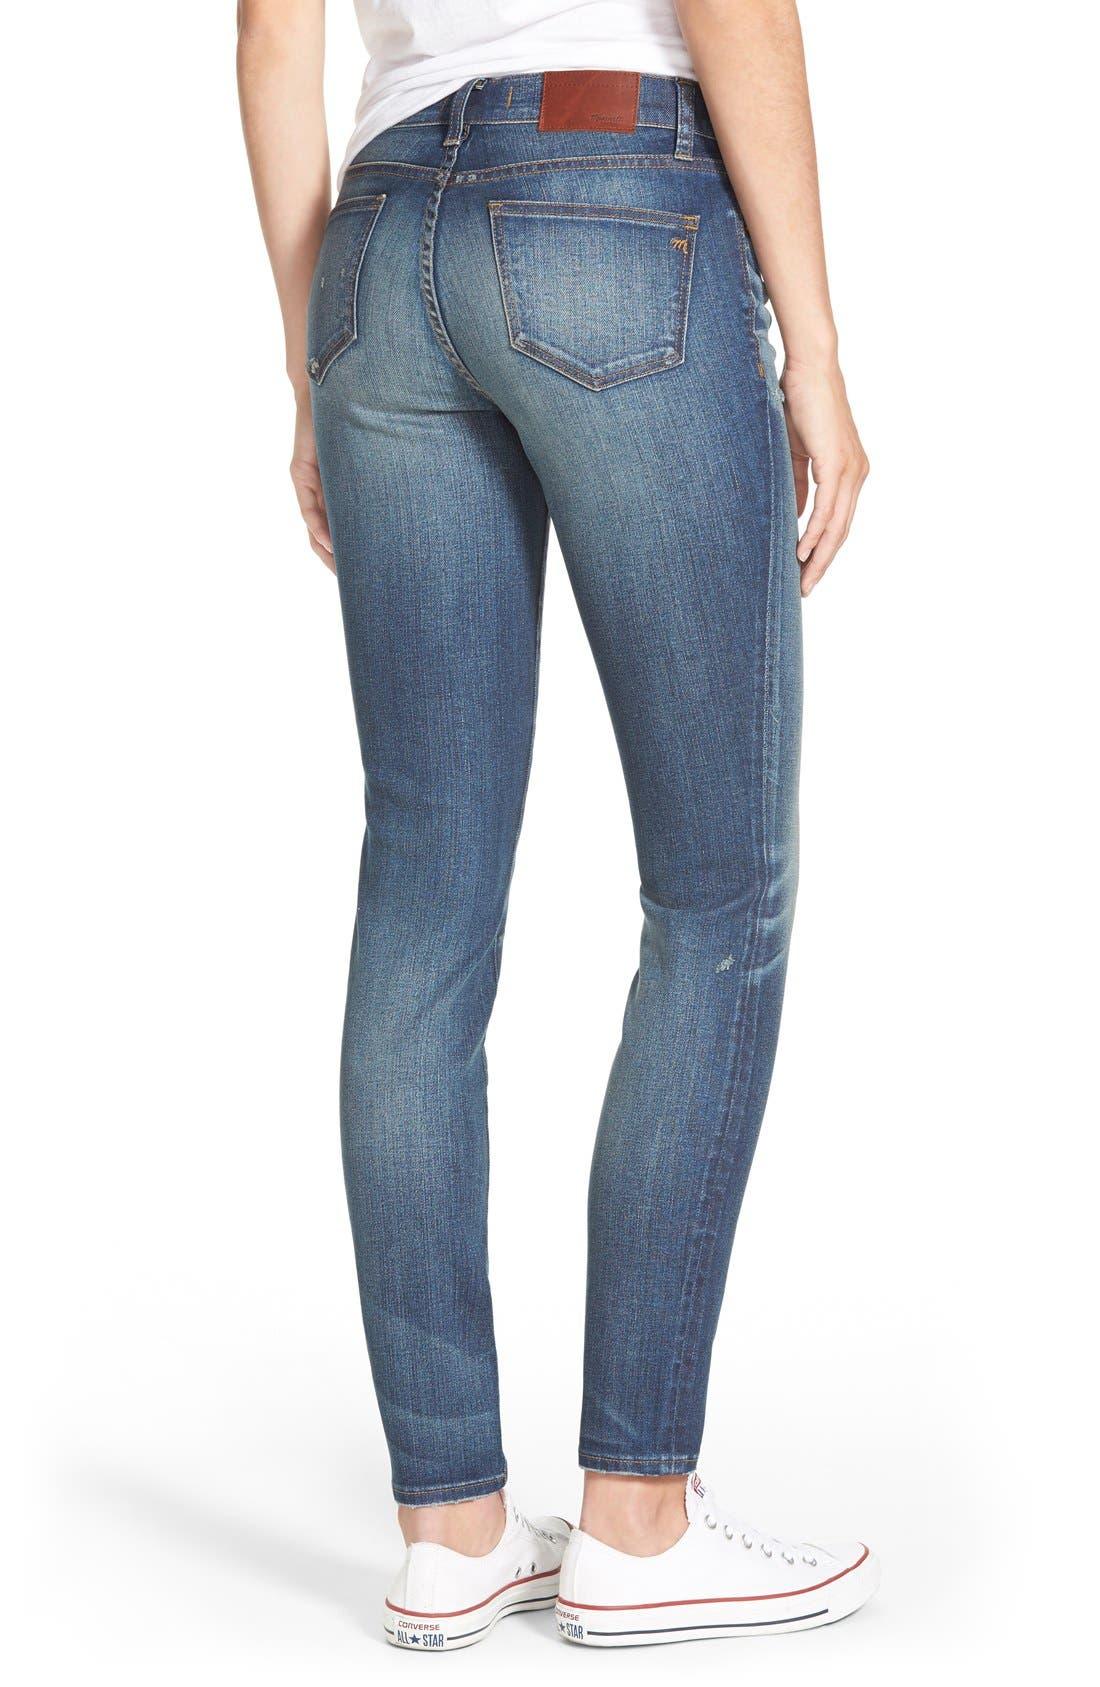 Alternate Image 2  - Madewell 'Skinny Skinny - Taller' Jeans (Edmonton Wash) (Long)